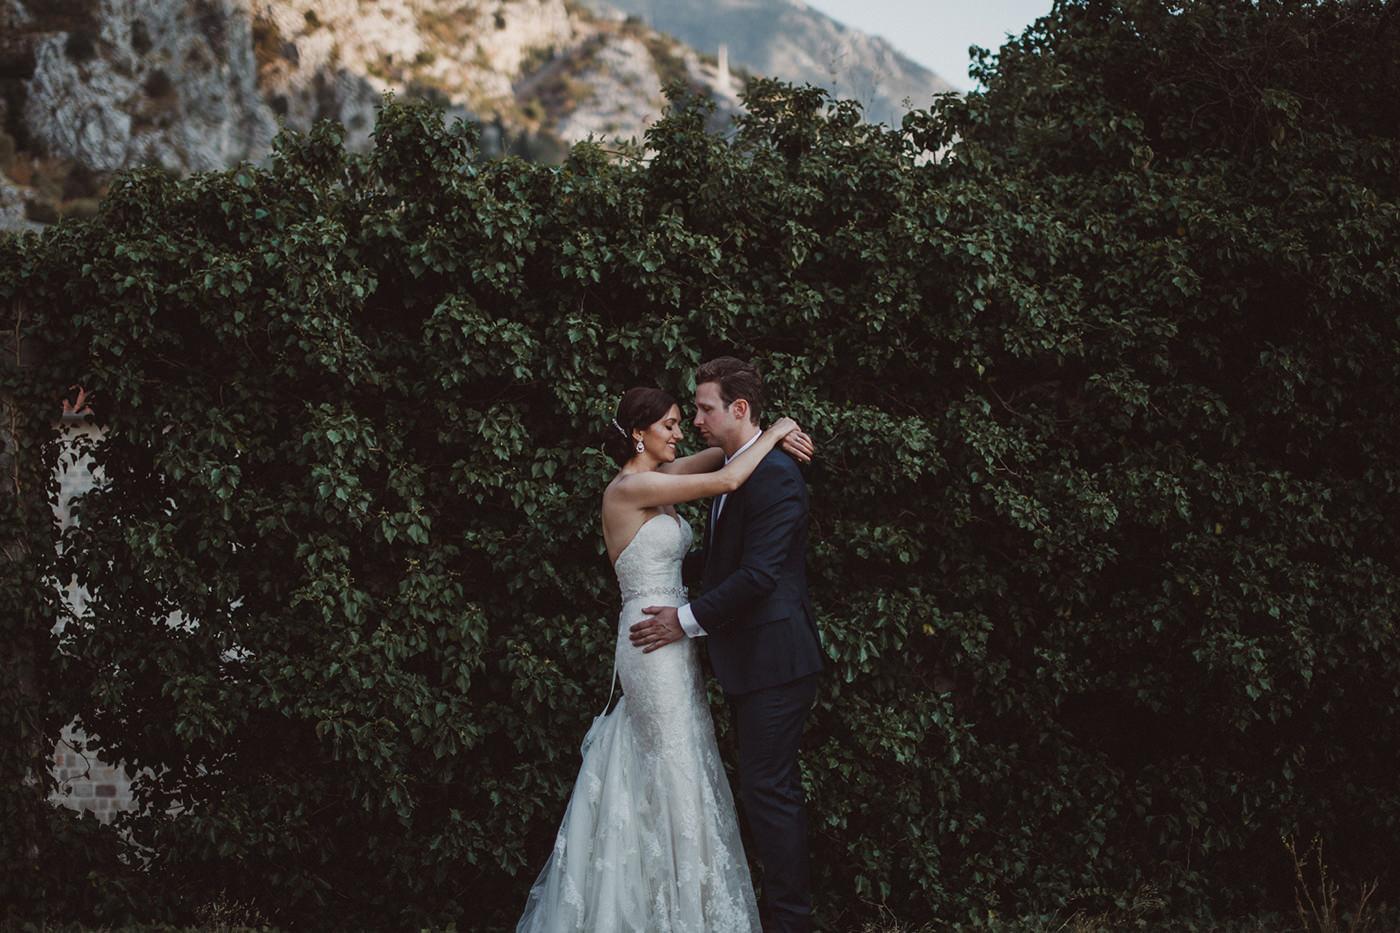 irena-ryan-destination-wedding-photographer-montenegro-kotor-0133